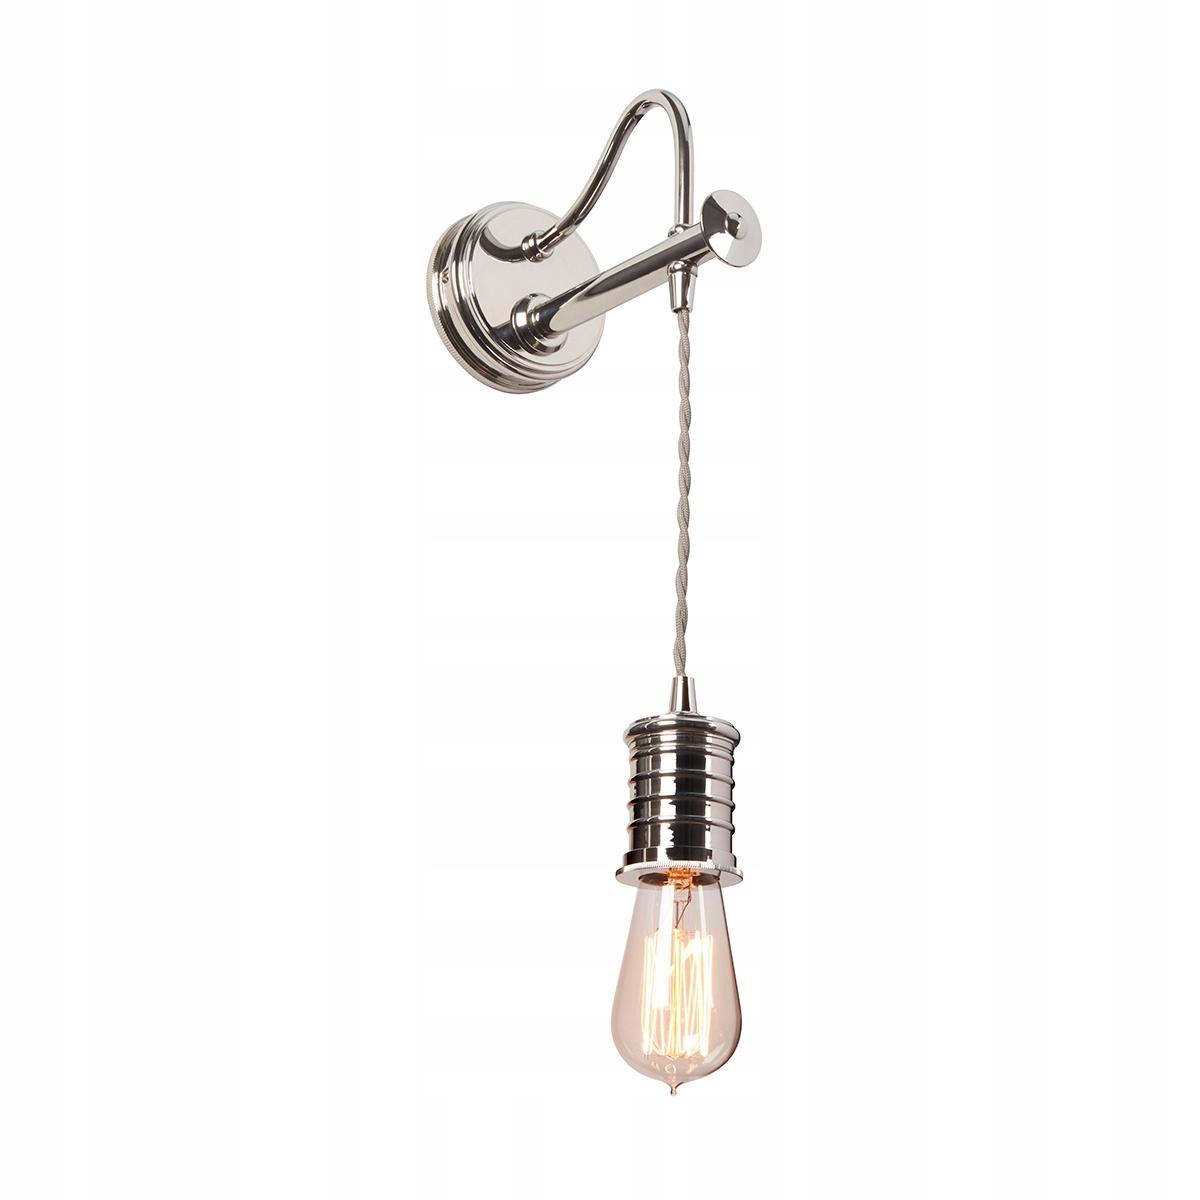 Elstead Osvetlenie DOUILLE DOUILLE1 PN nástenné svietidlo 1x60W